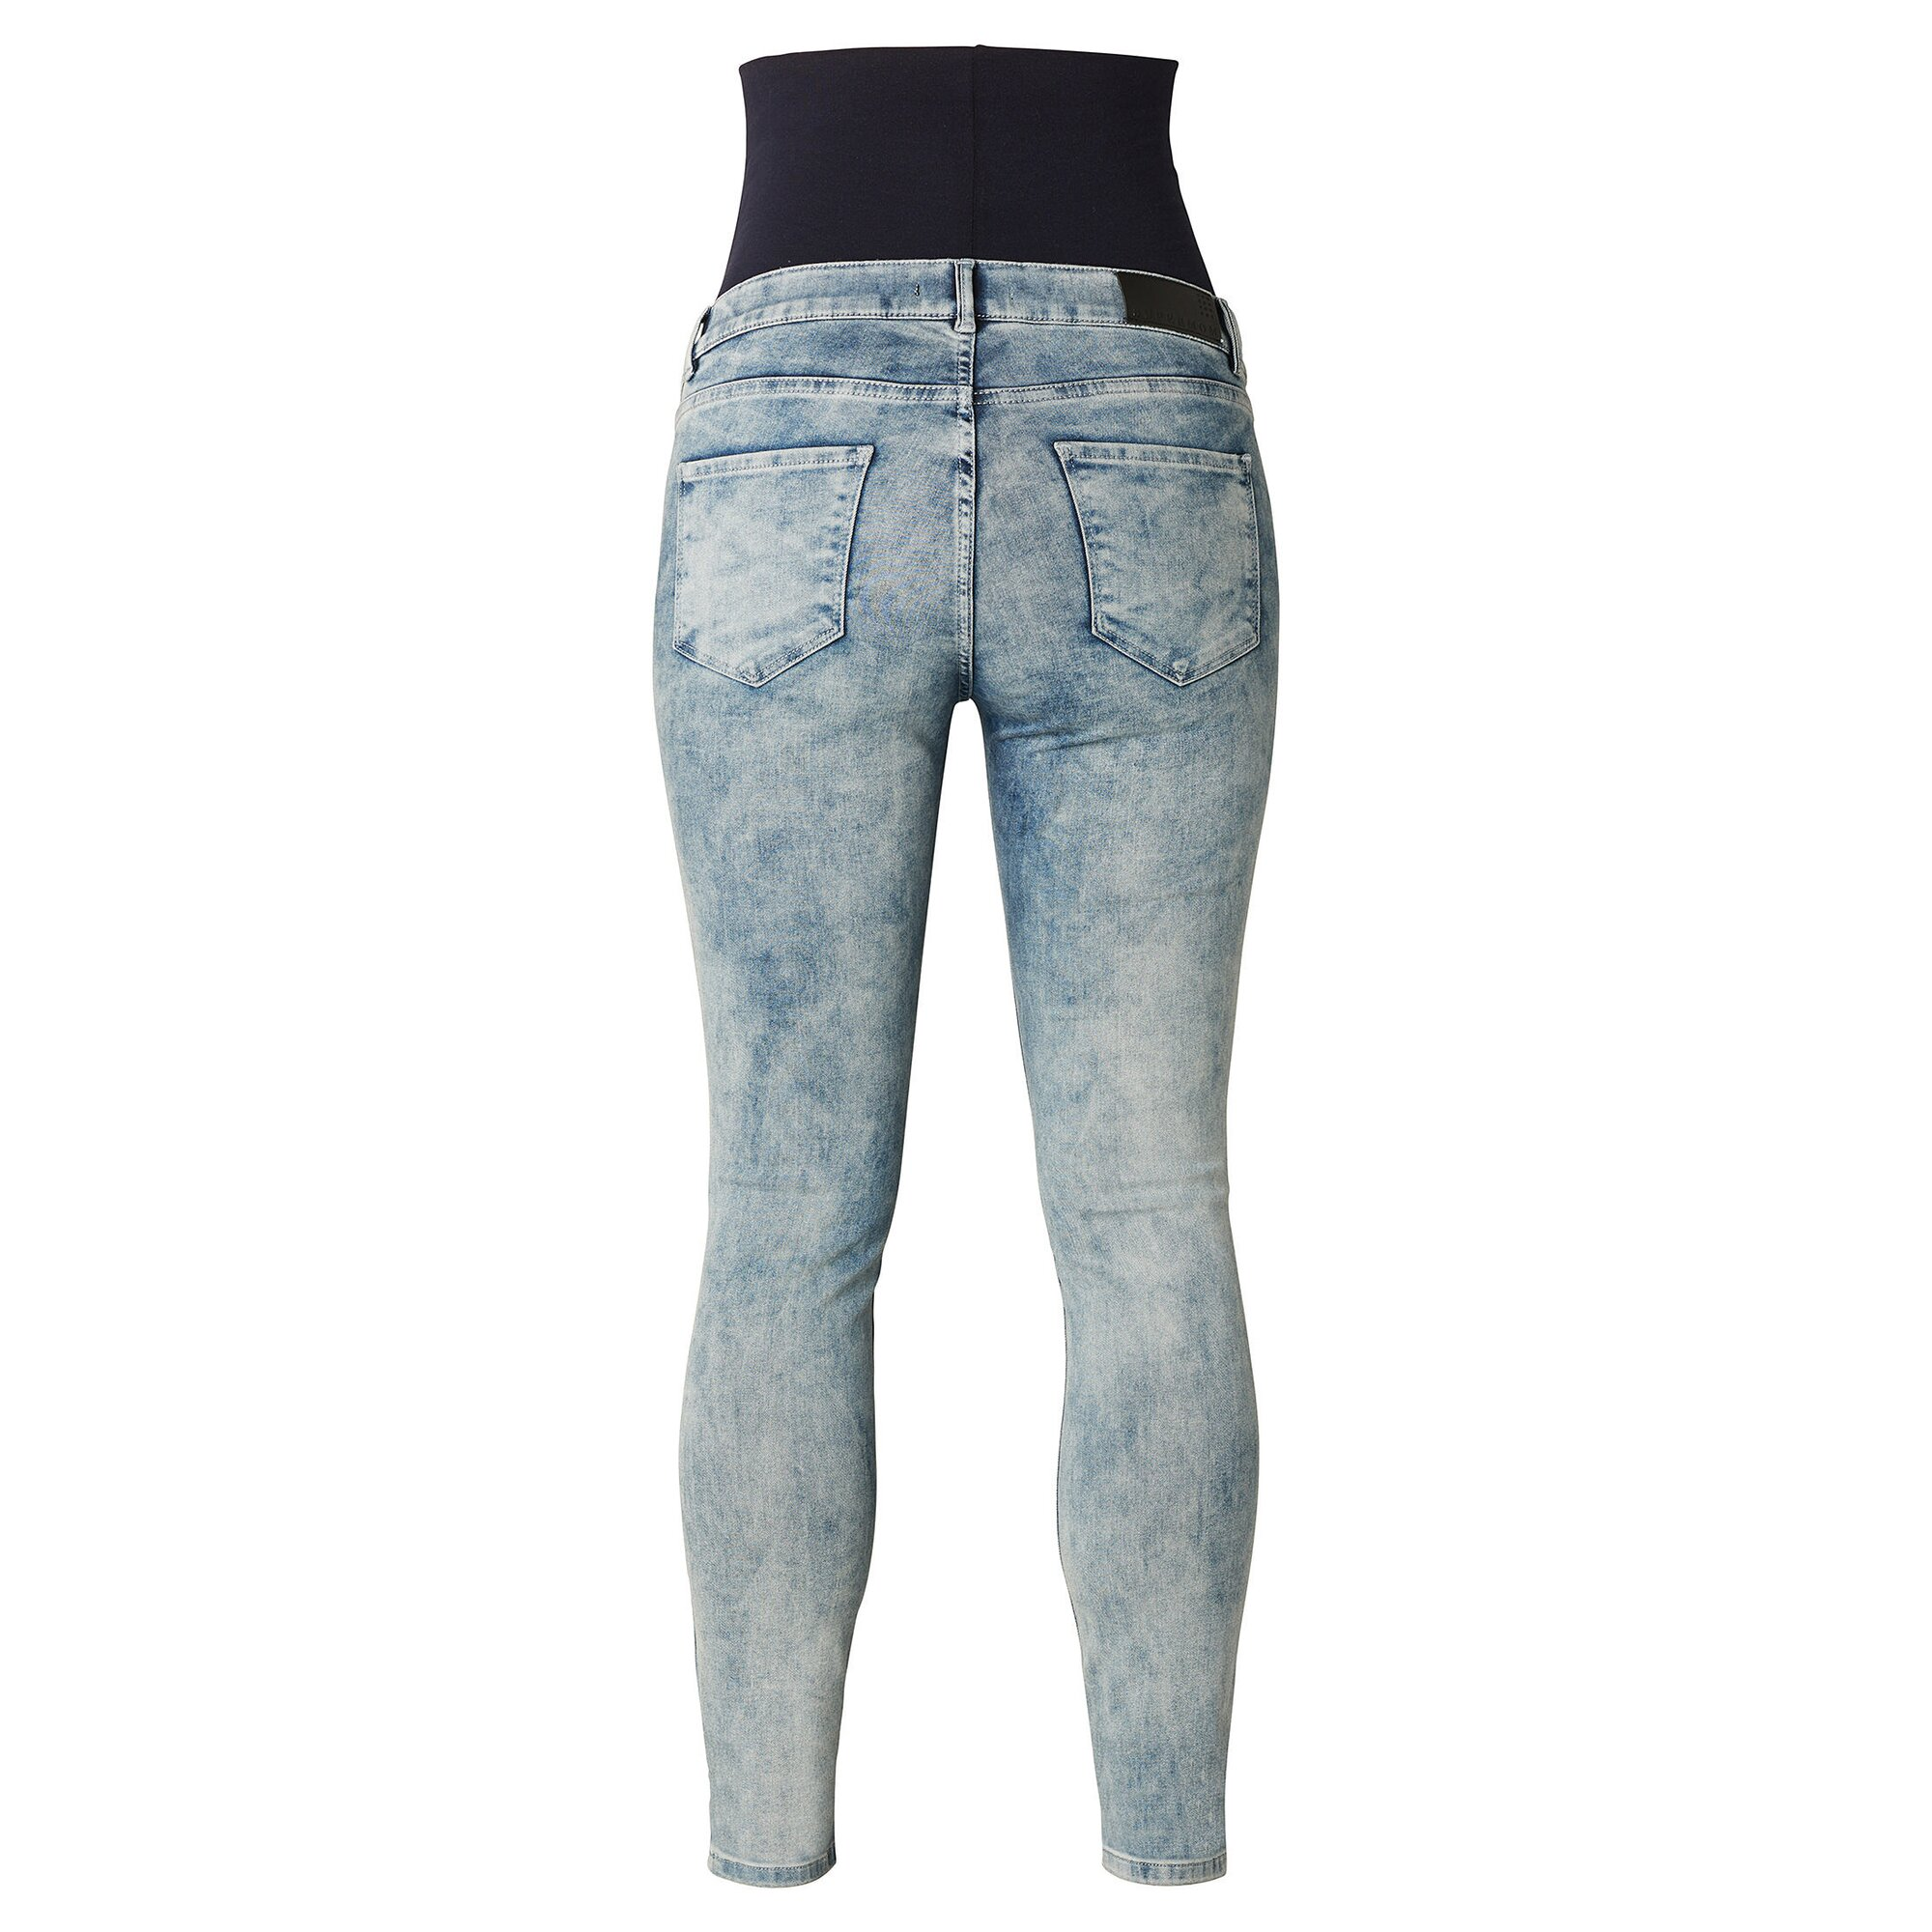 supermom-skinny-umstandsjeans-grey-blue